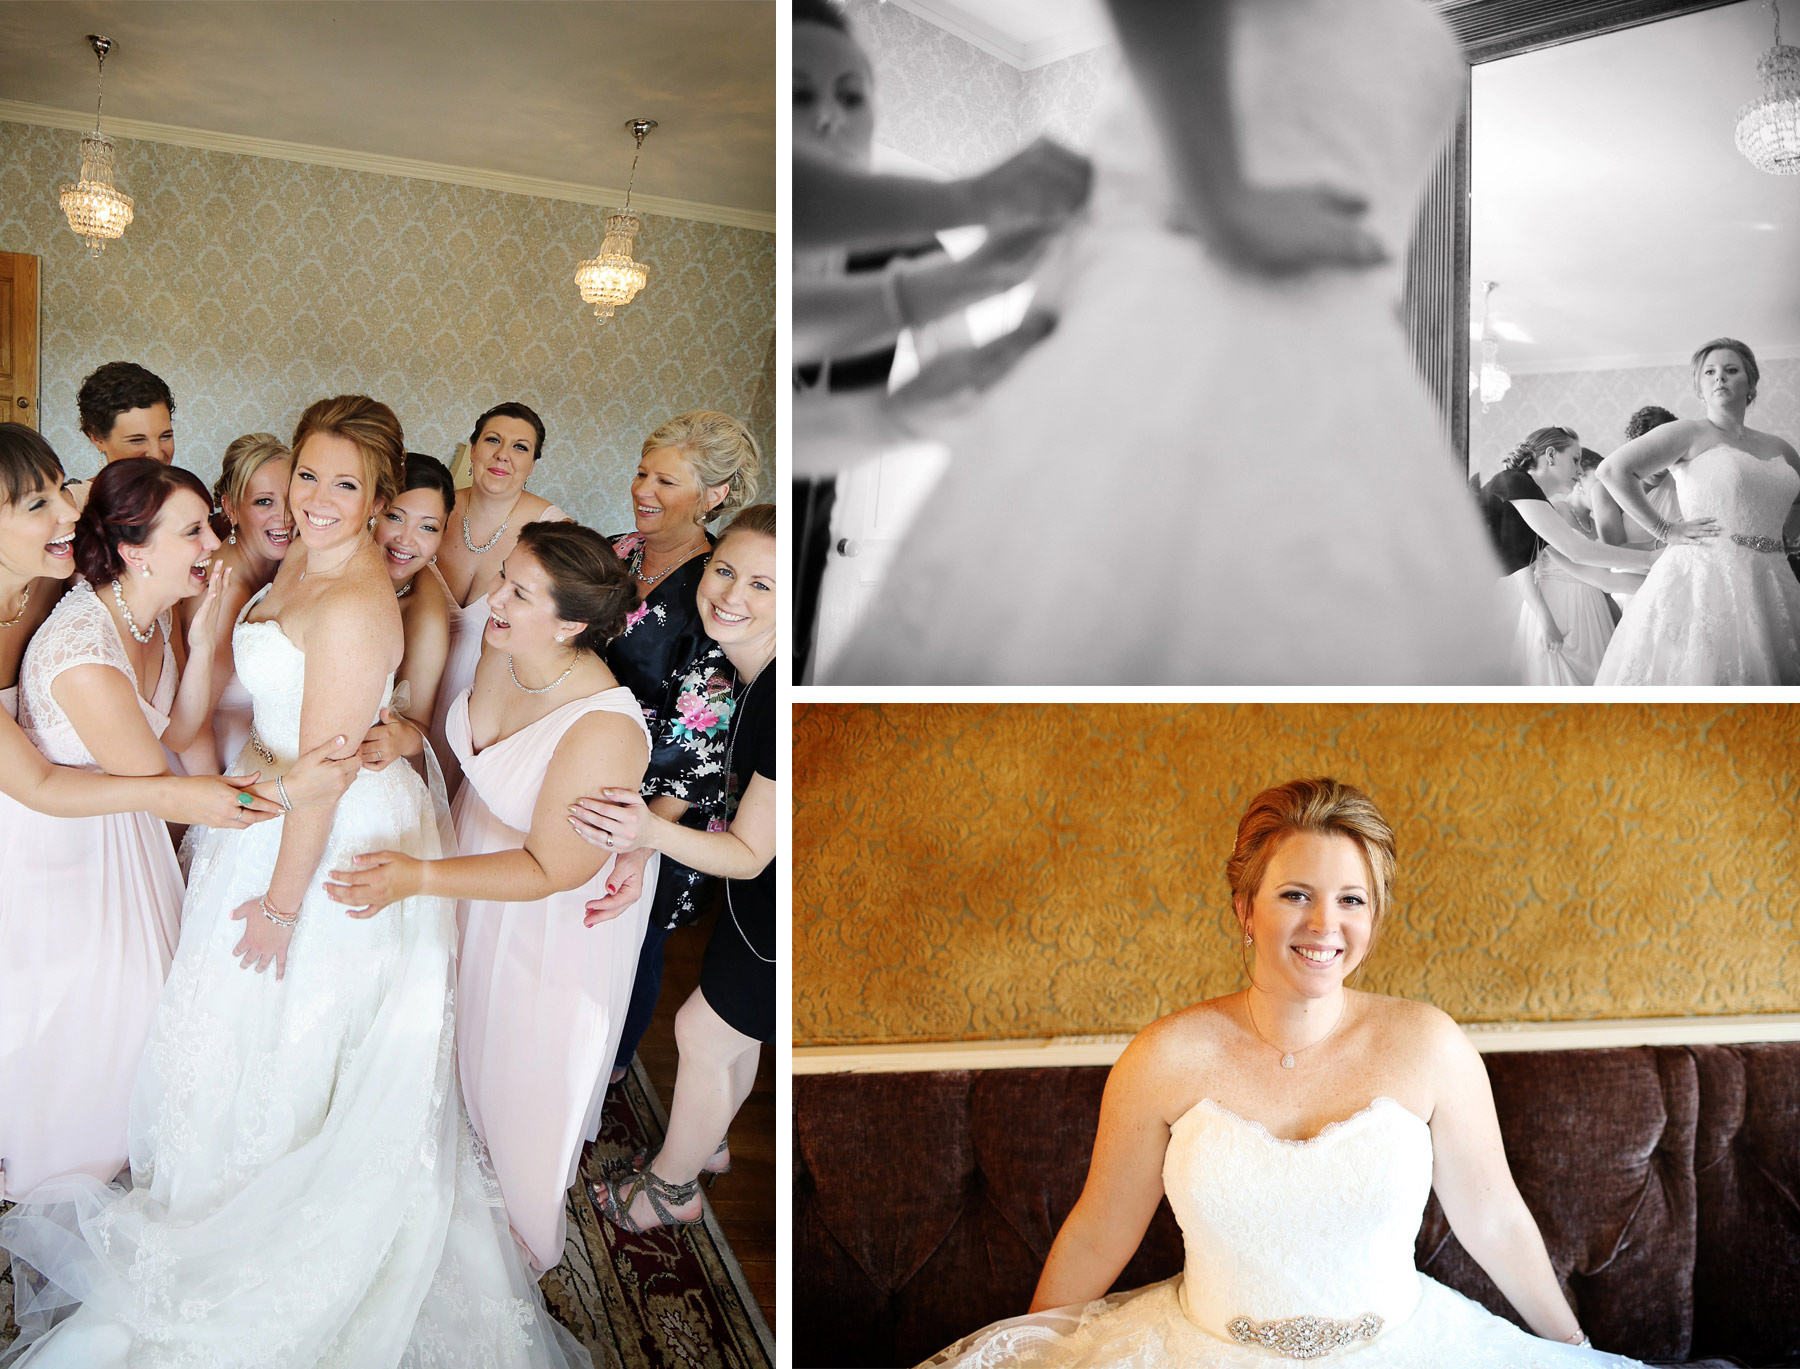 02-Minneapolis-Minnesota-Wedding-Photography-by-Vick-Photography-Semple-Mansion-Wedding-Morning-Bride-Dress-Caitlin-&-Derrick.jpg